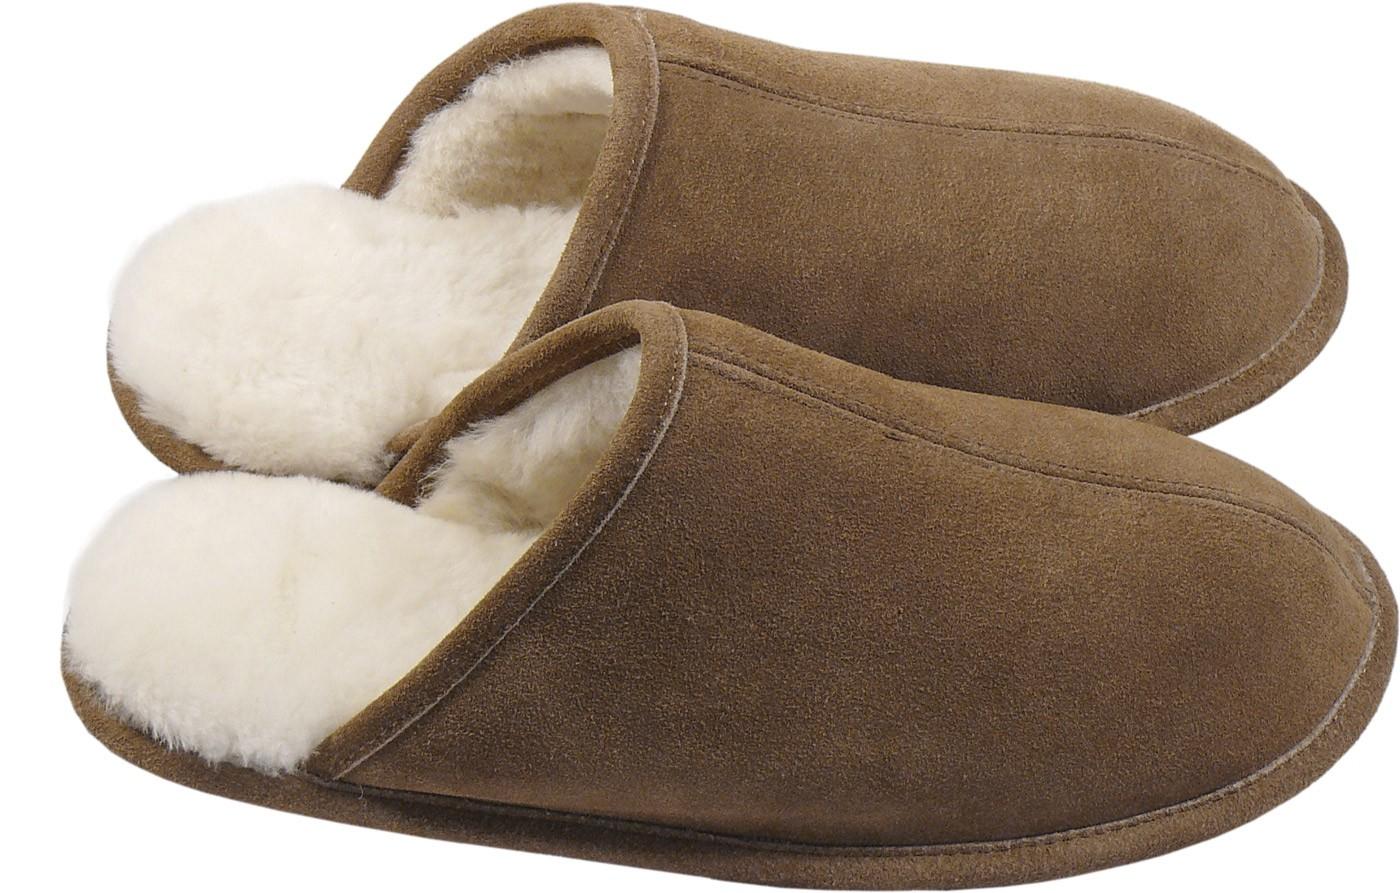 extra dicke pantoffeln aus lammfell mit ledersohle 2 farben fellartikel herren hausschuhe. Black Bedroom Furniture Sets. Home Design Ideas